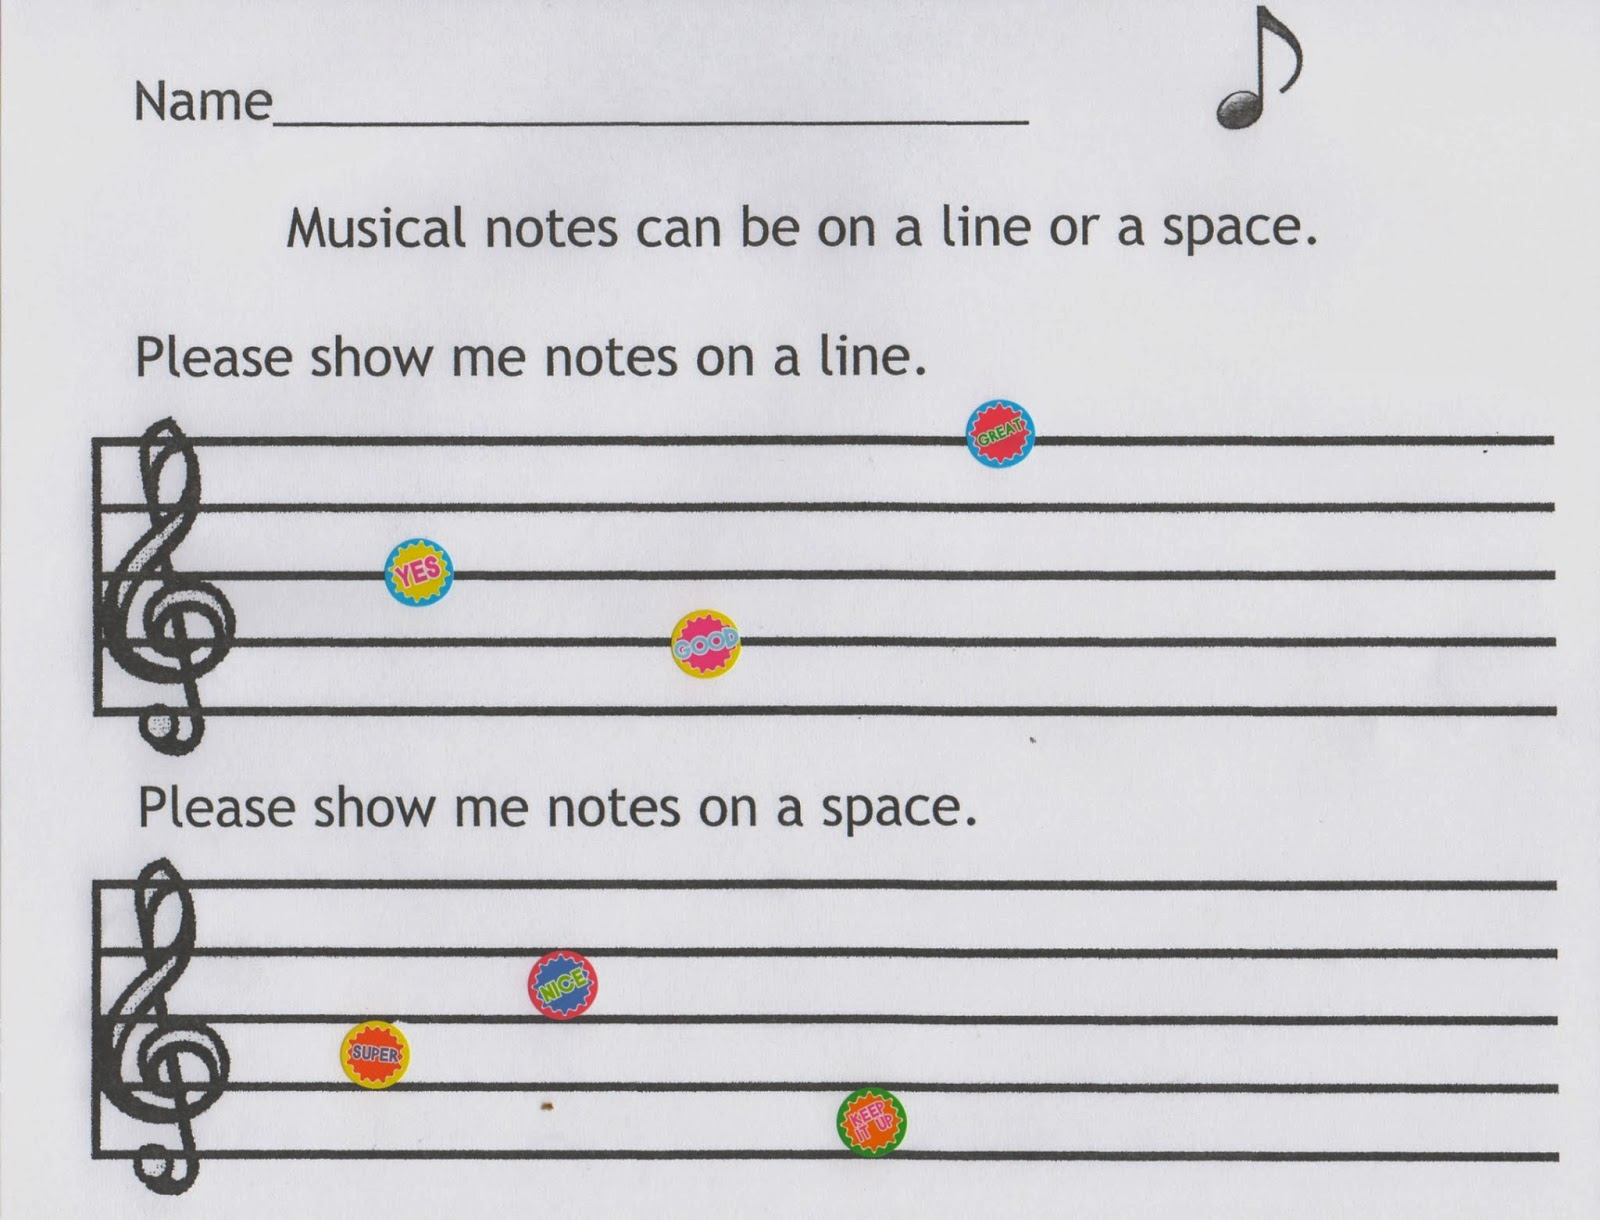 Nhcs Music Education October